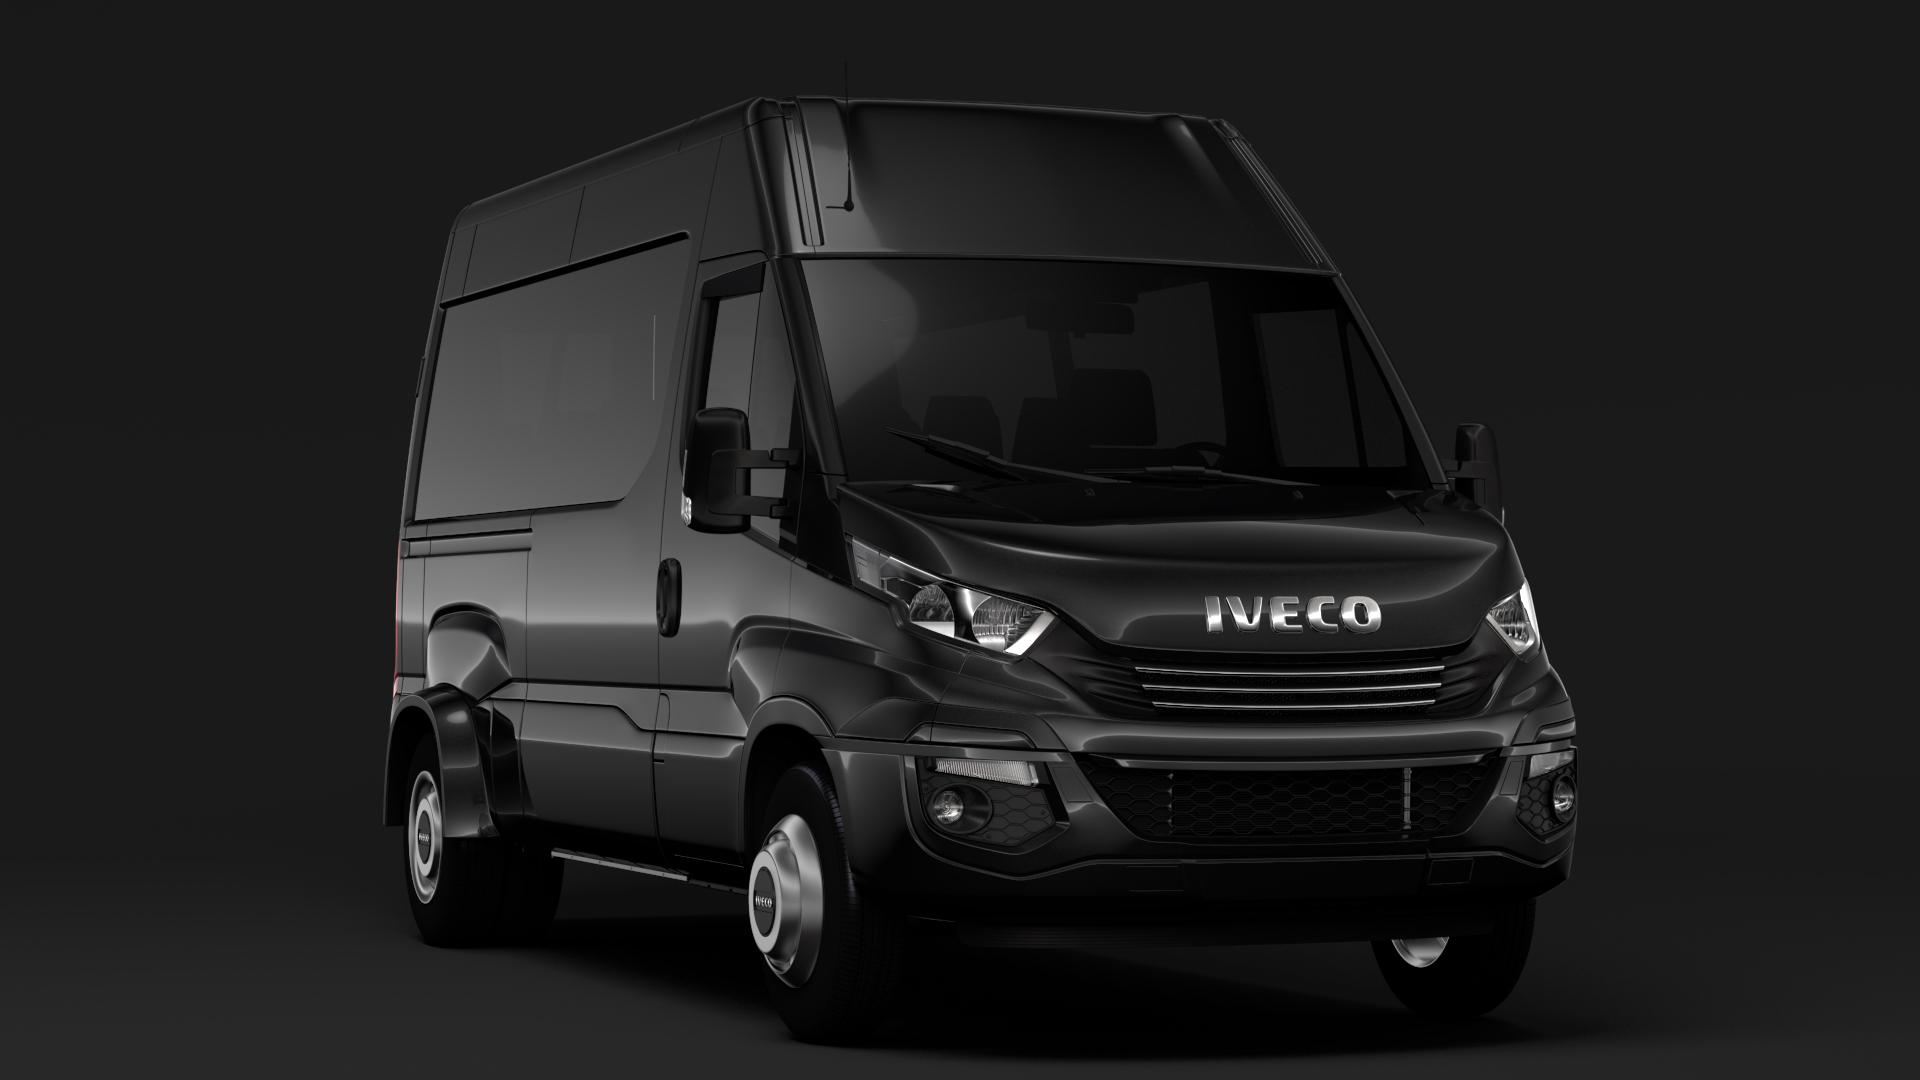 iveco daily minibus l2h2 2017 3d model max fbx c4d lwo ma mb hrc xsi obj 276010